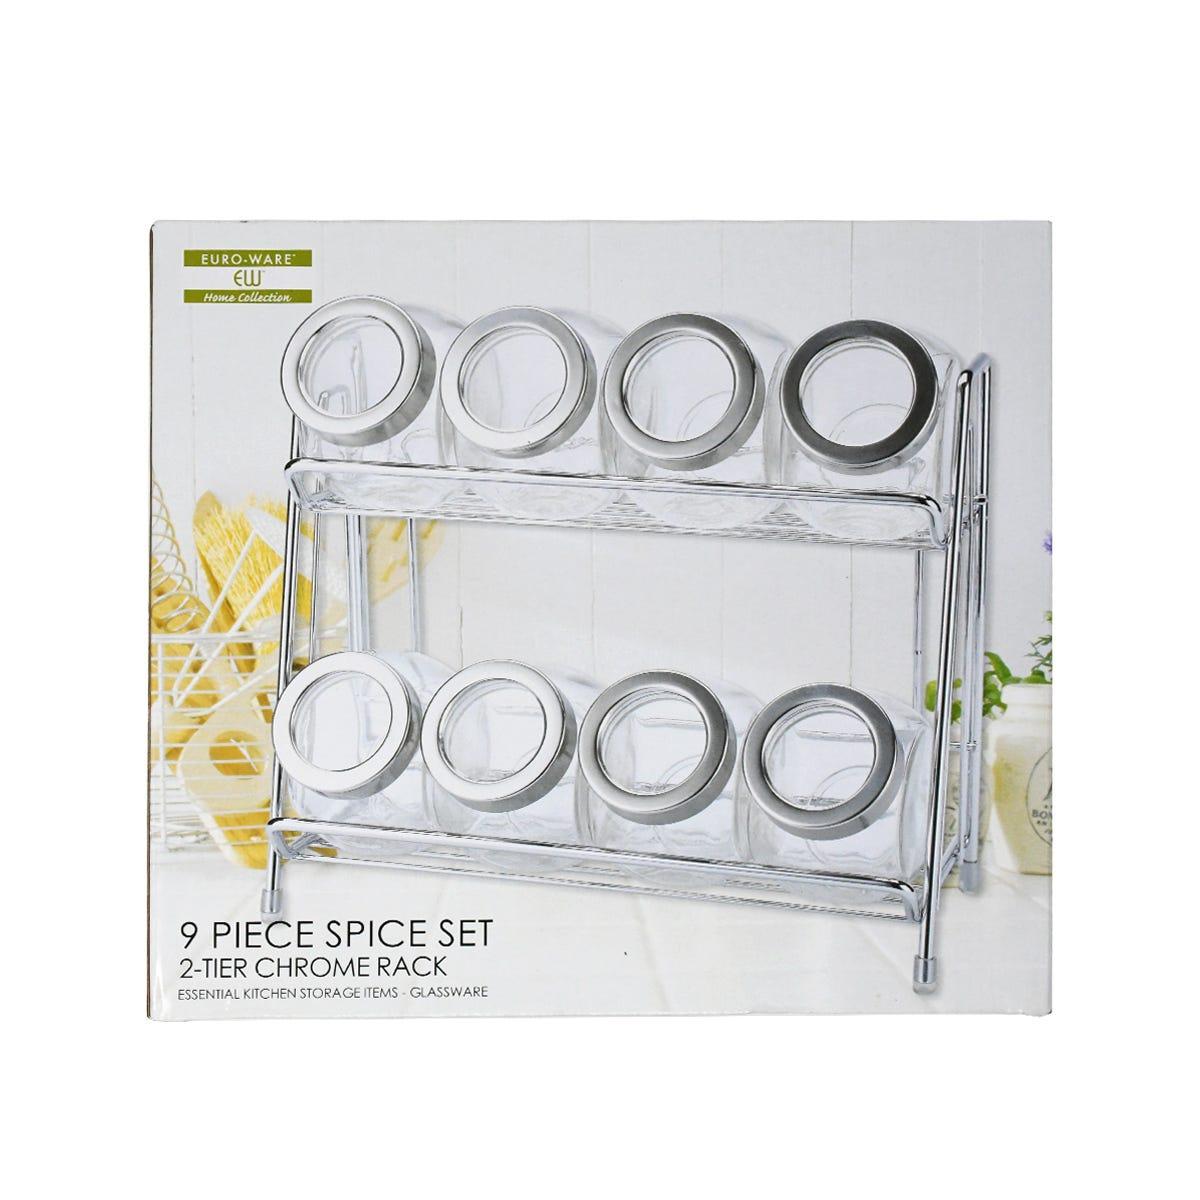 Set de frascos de vidrio Euro-Home para especias con estante, 9 piezas